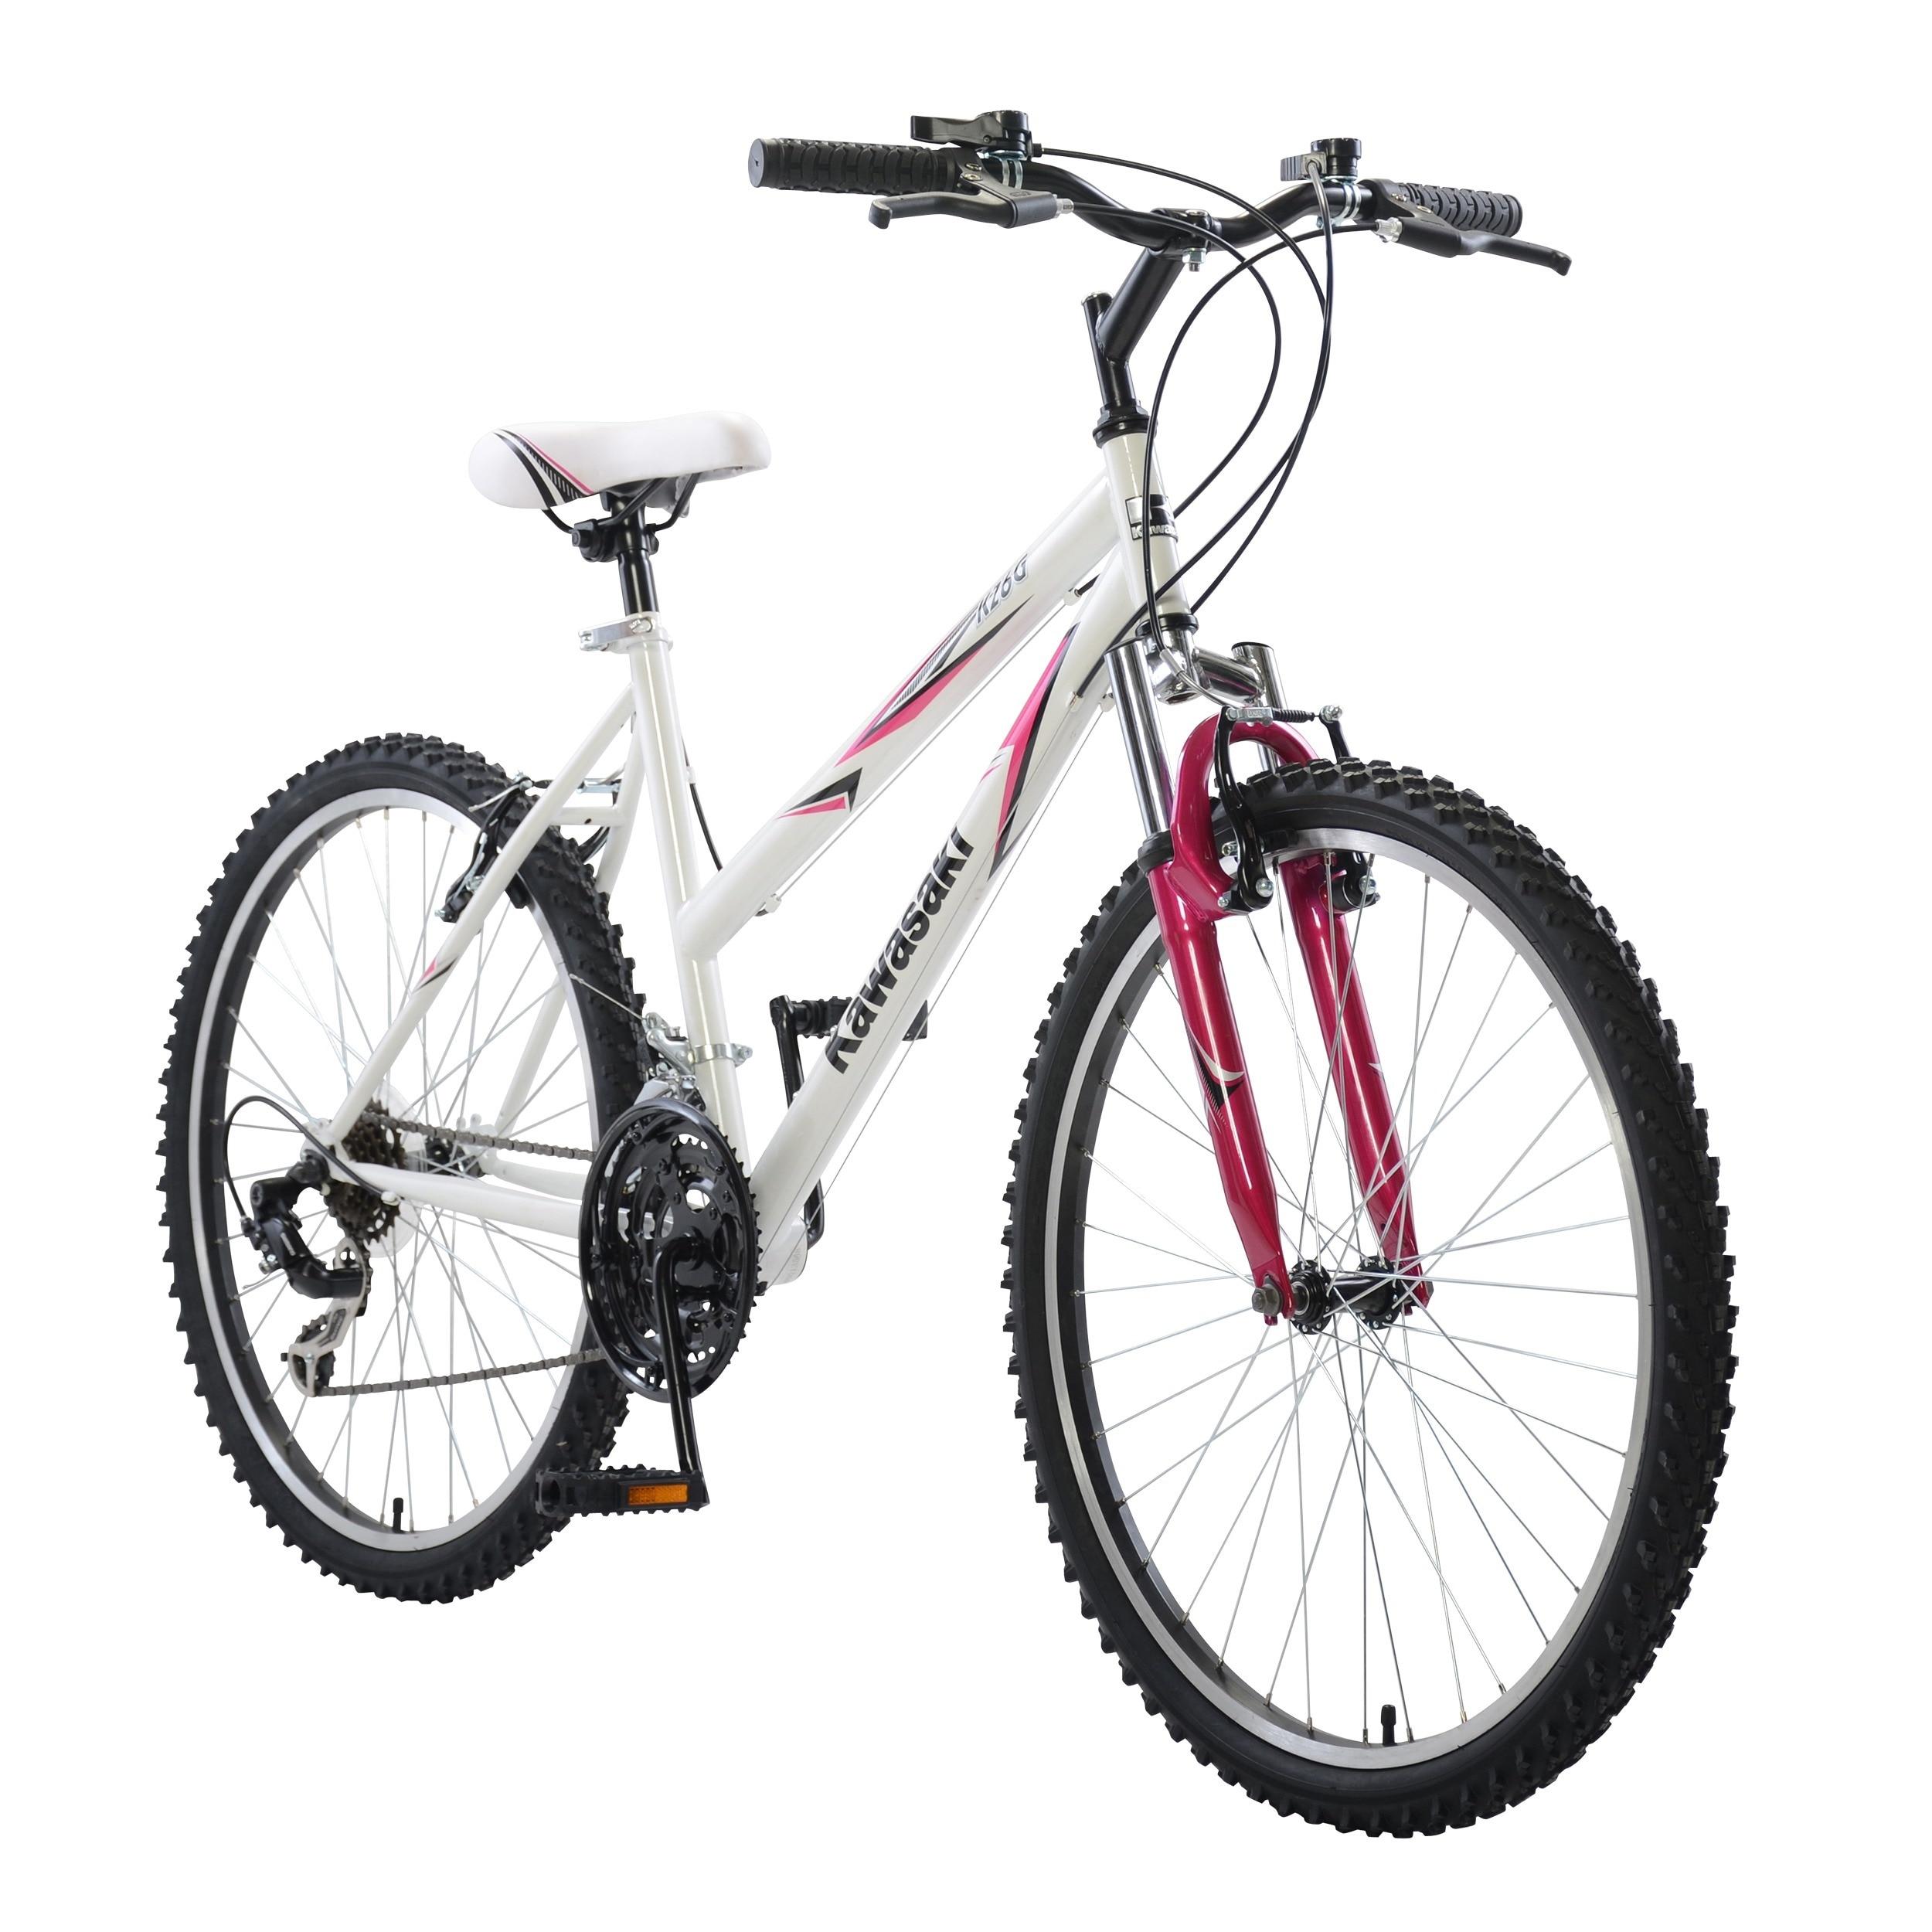 s overstock sports toys titan pathfinder mens all Tire Size Ford Ranger Edge kawasaki k26g 26 hardtail mtb bicycle 7aeed1aa bd4c 4600 926d f7221f2275b5